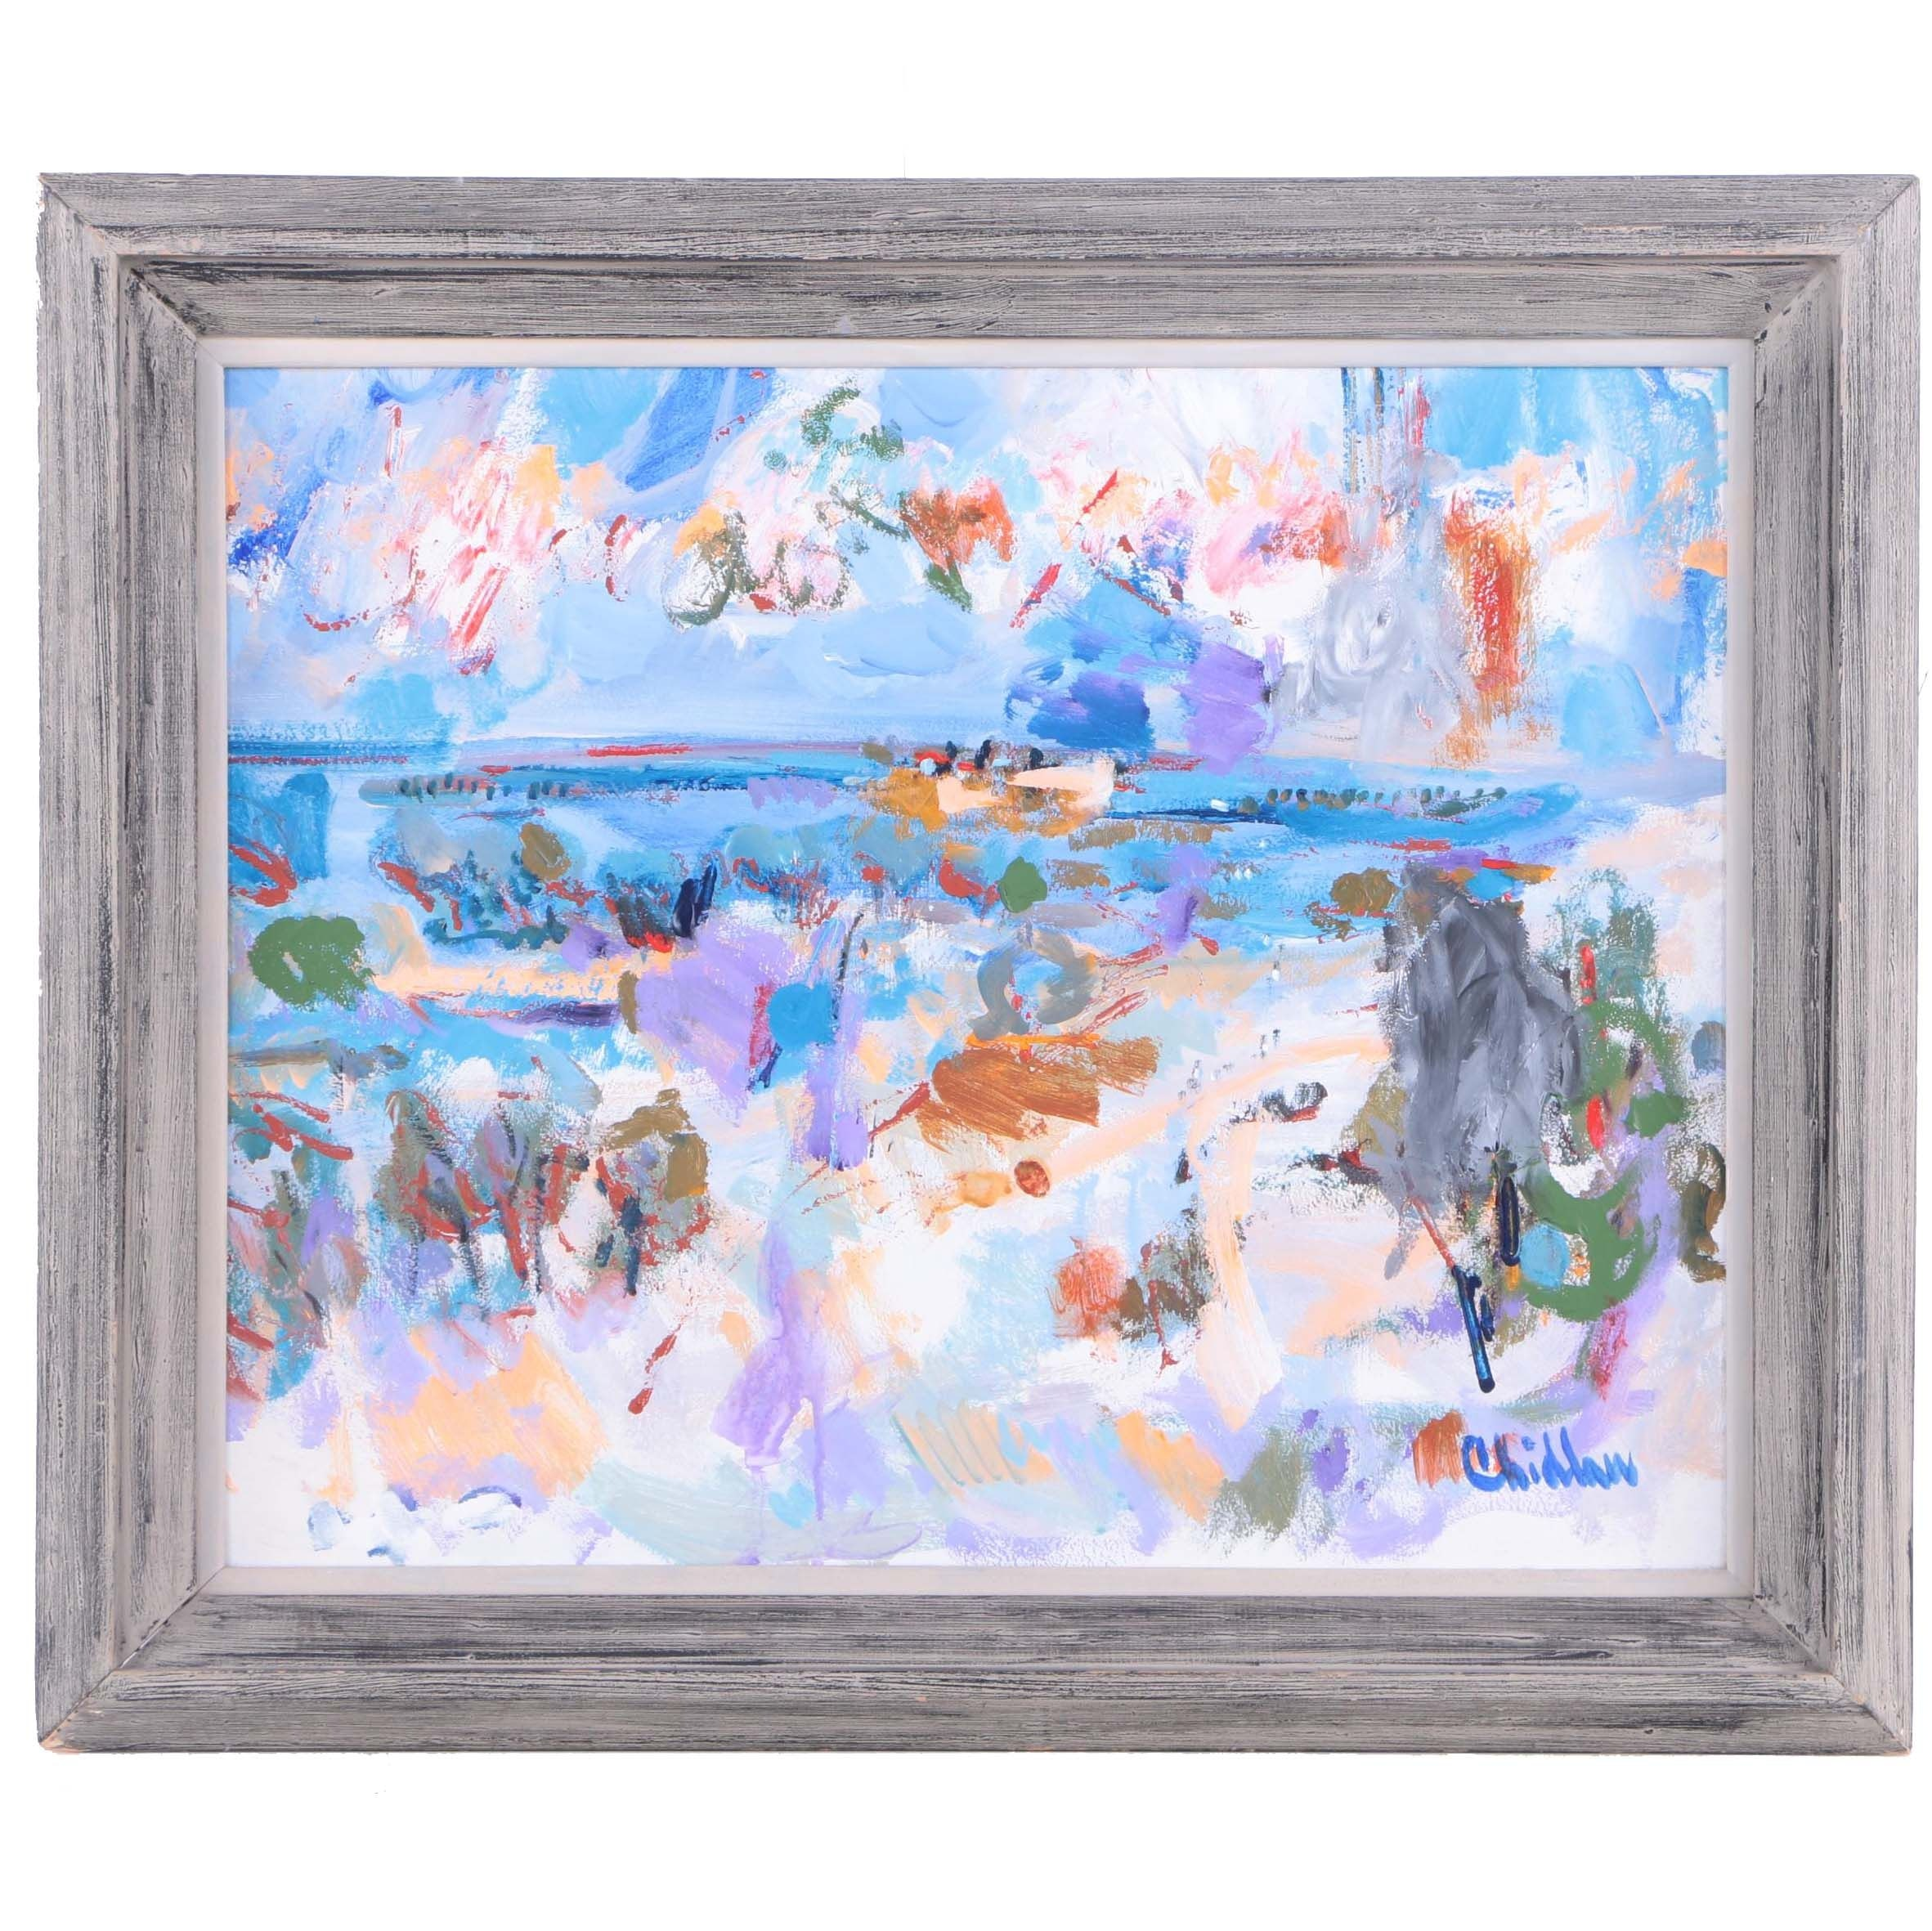 Paul Chidlaw Oil Painting on Canvas Beach Landscape